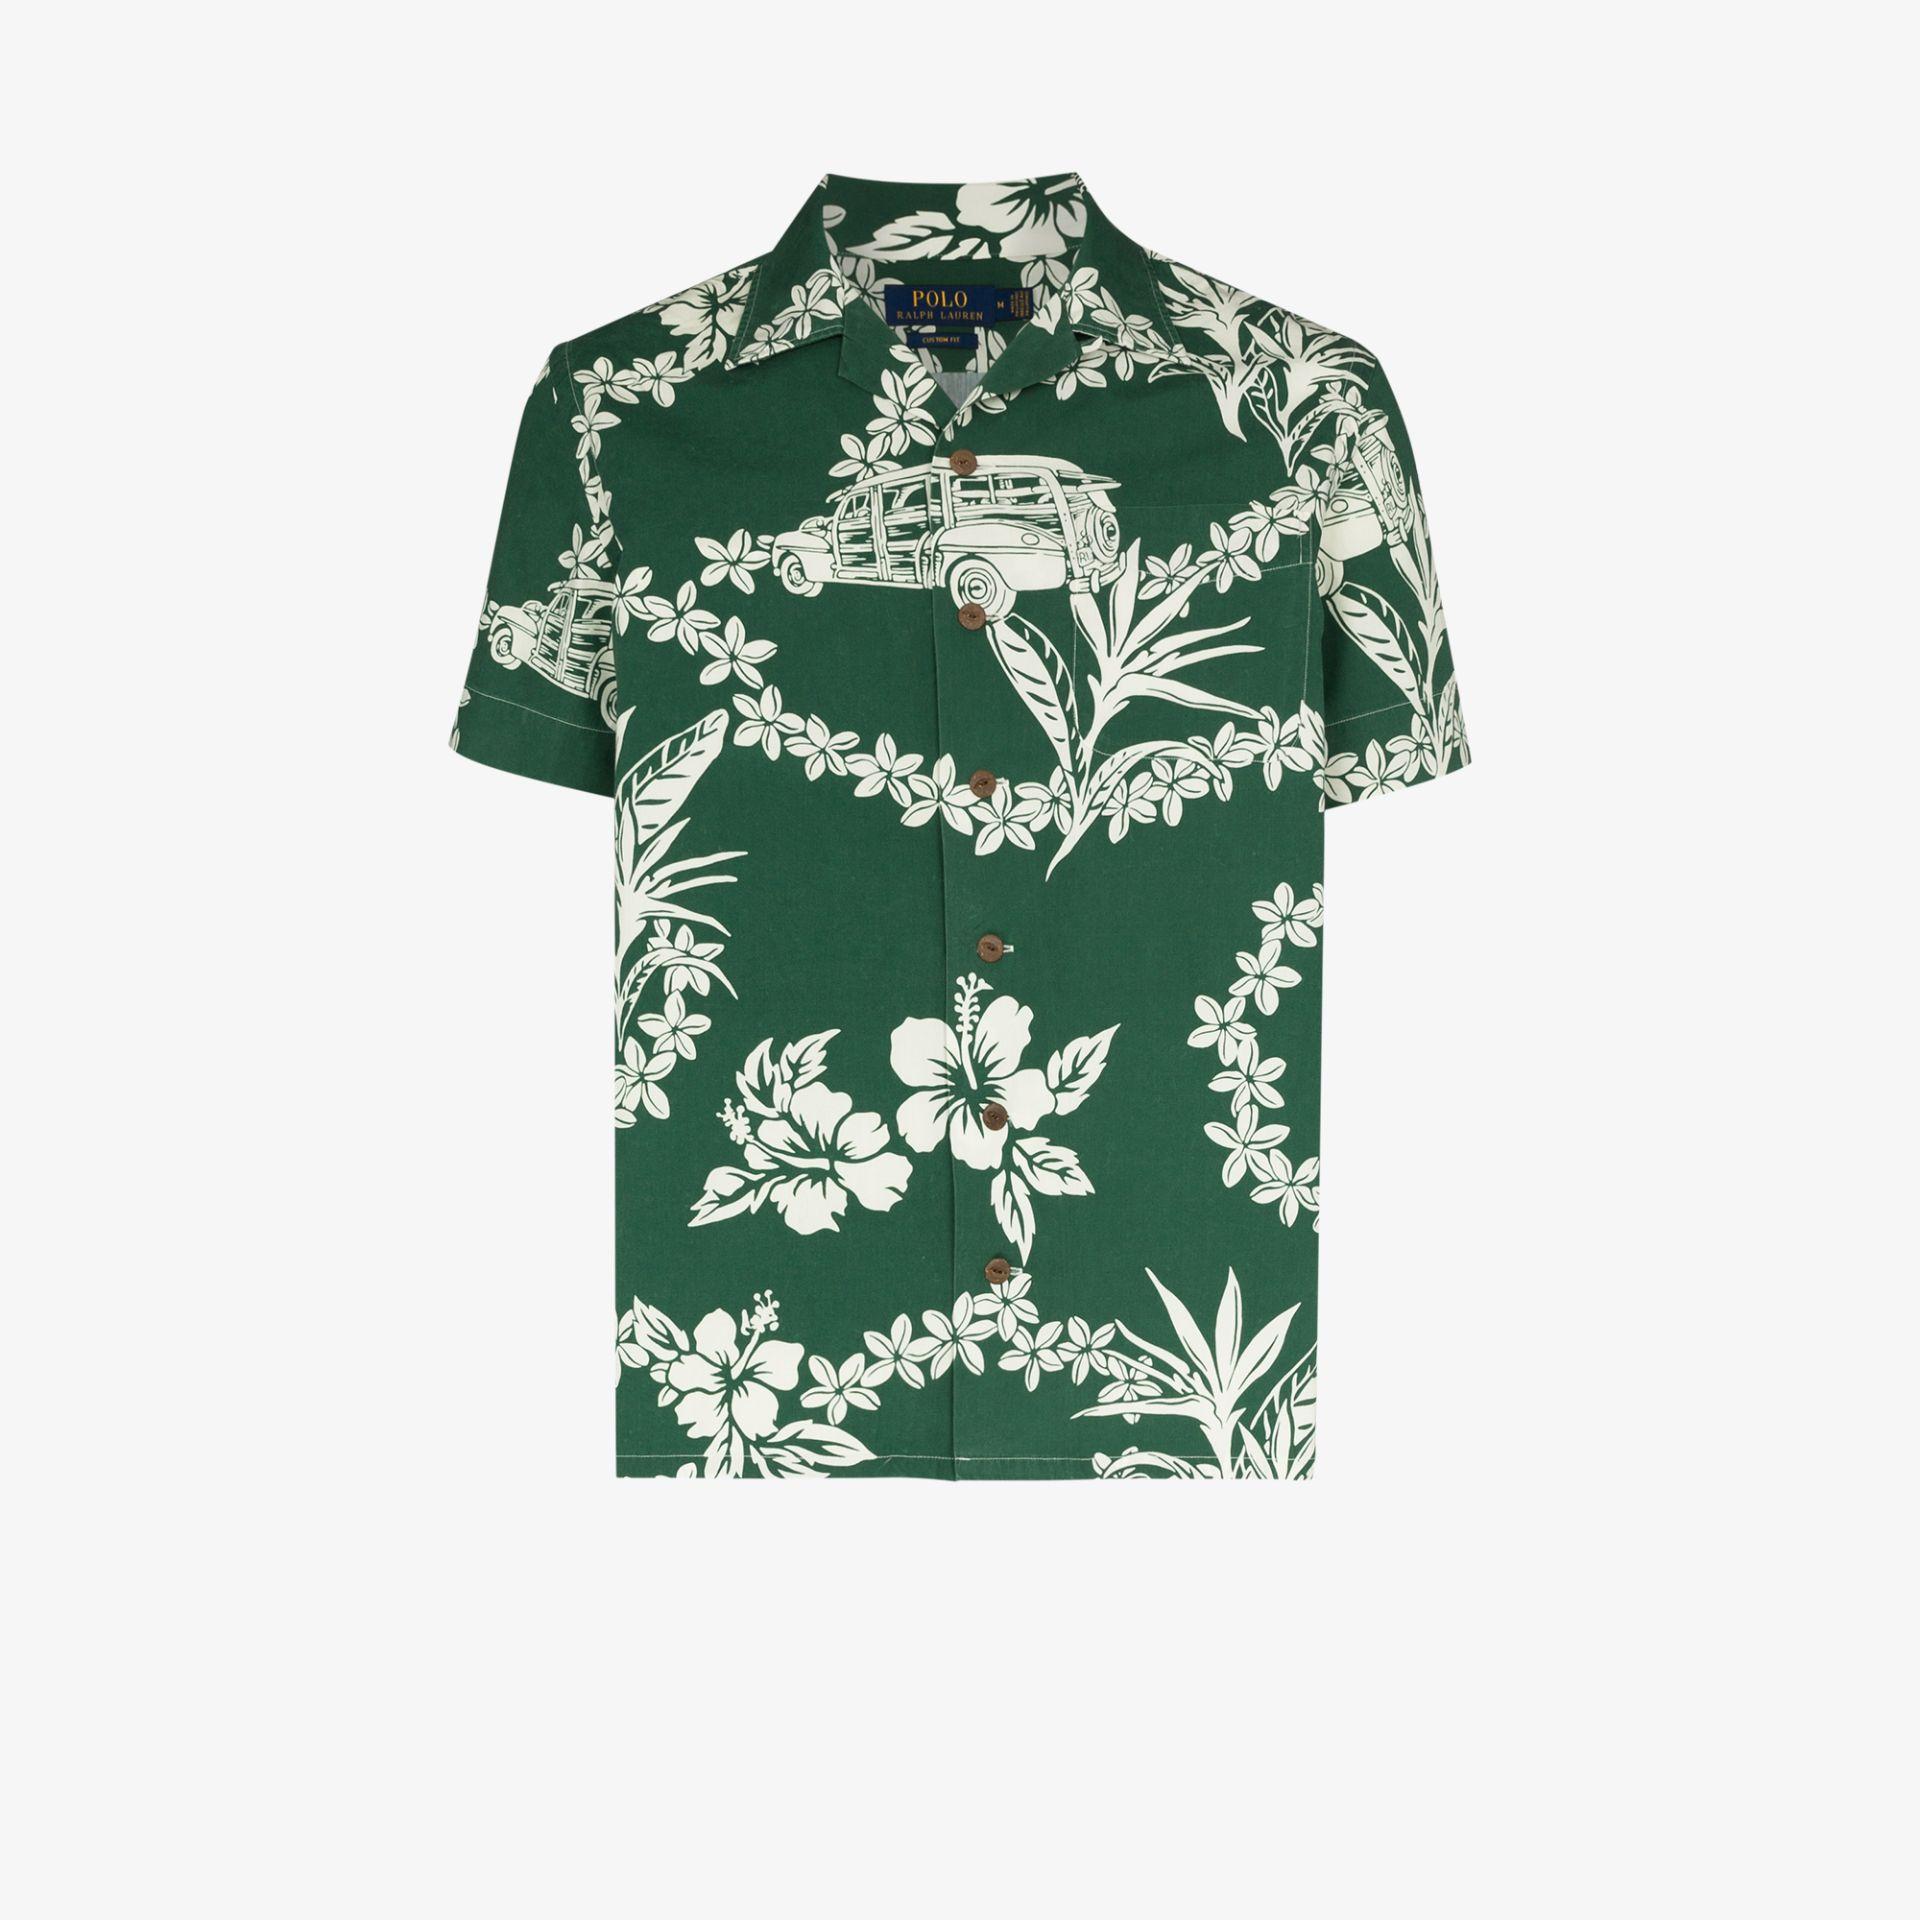 Guide London Tropical Leaf Print Cotton Polo T-Shirt SJ4986